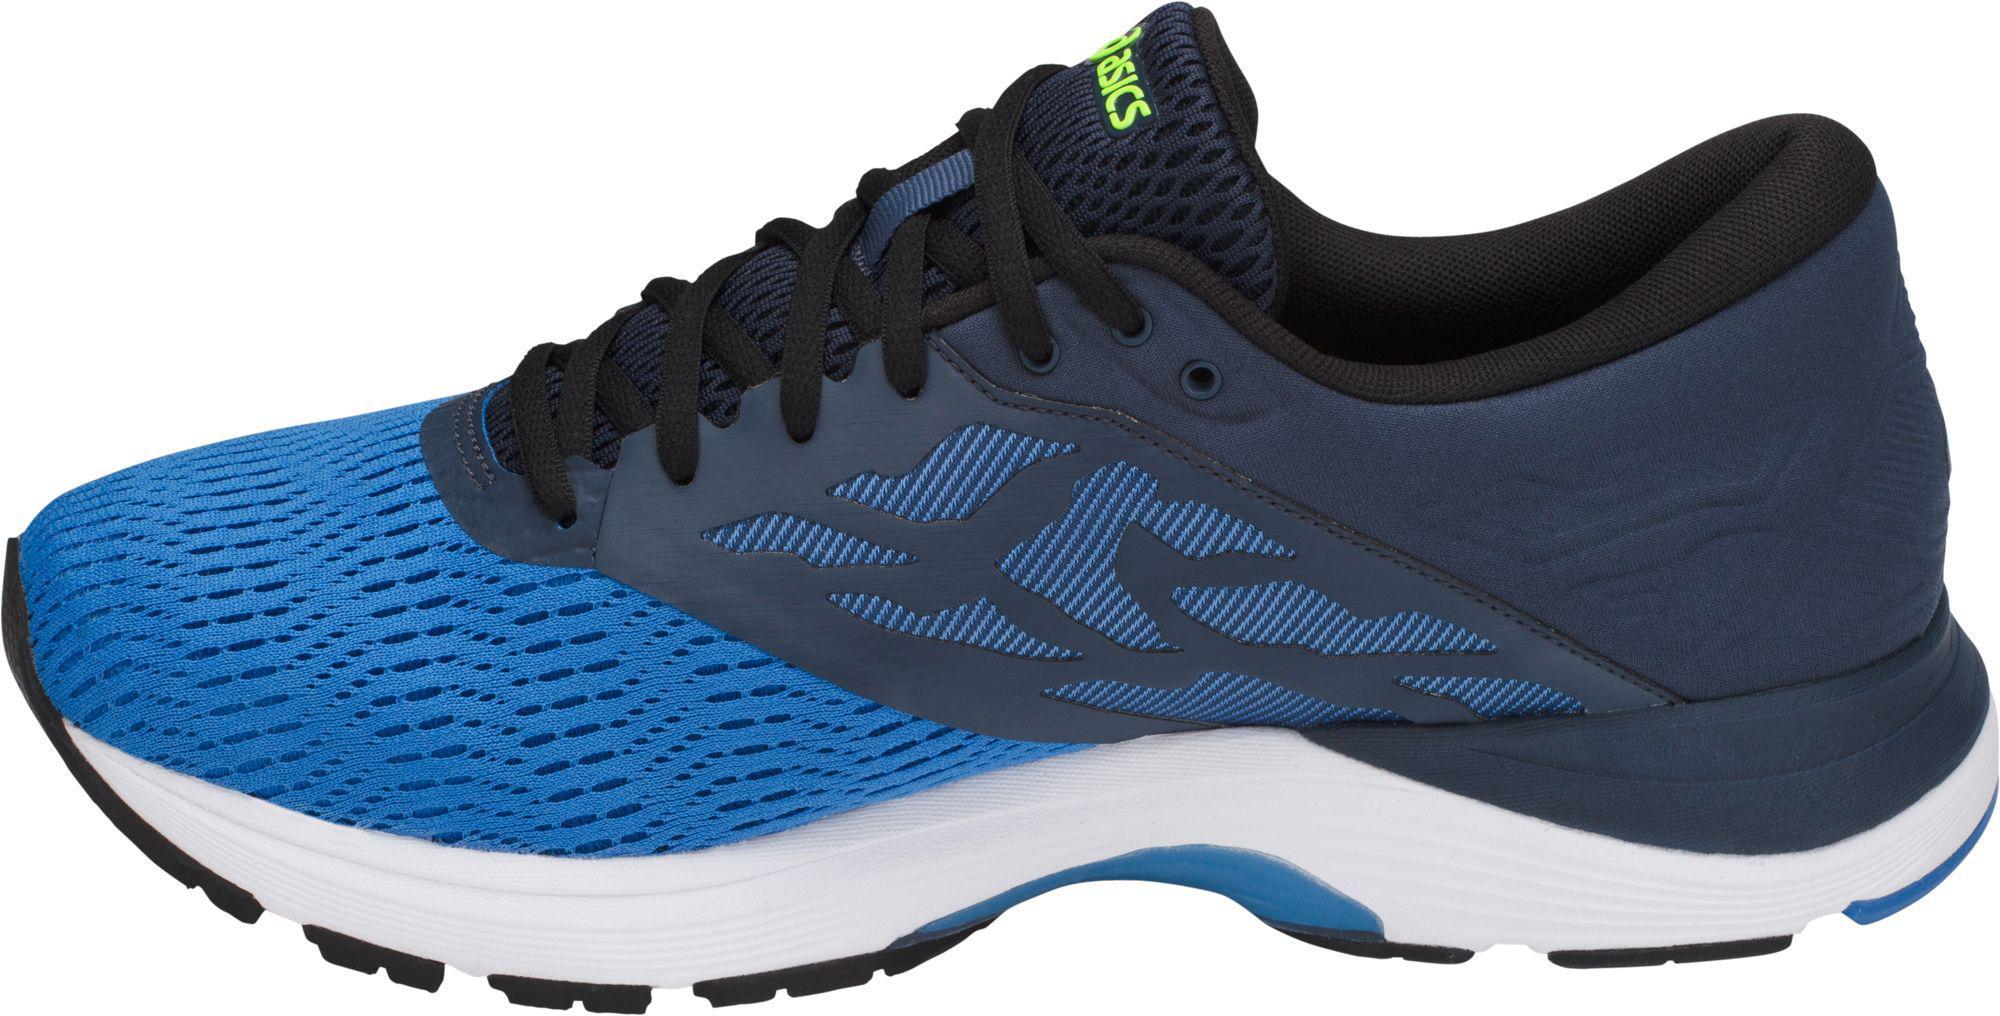 7add3df2179 Men's Blue Gel-flux 5 Running Shoes